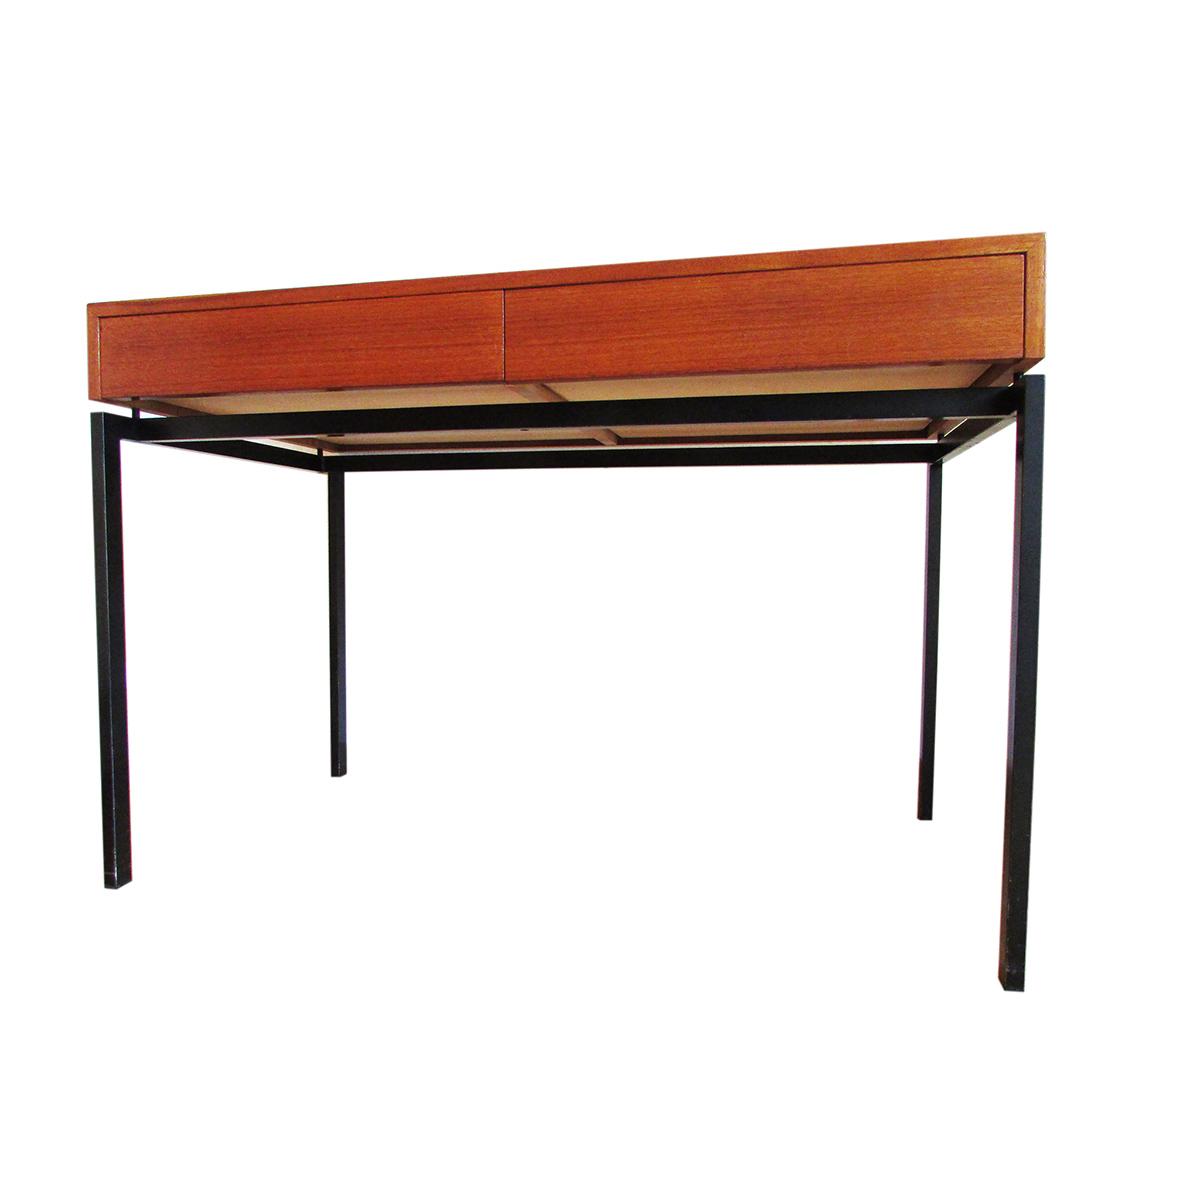 vintage-writing-desk-teak-zingg-lamprecht